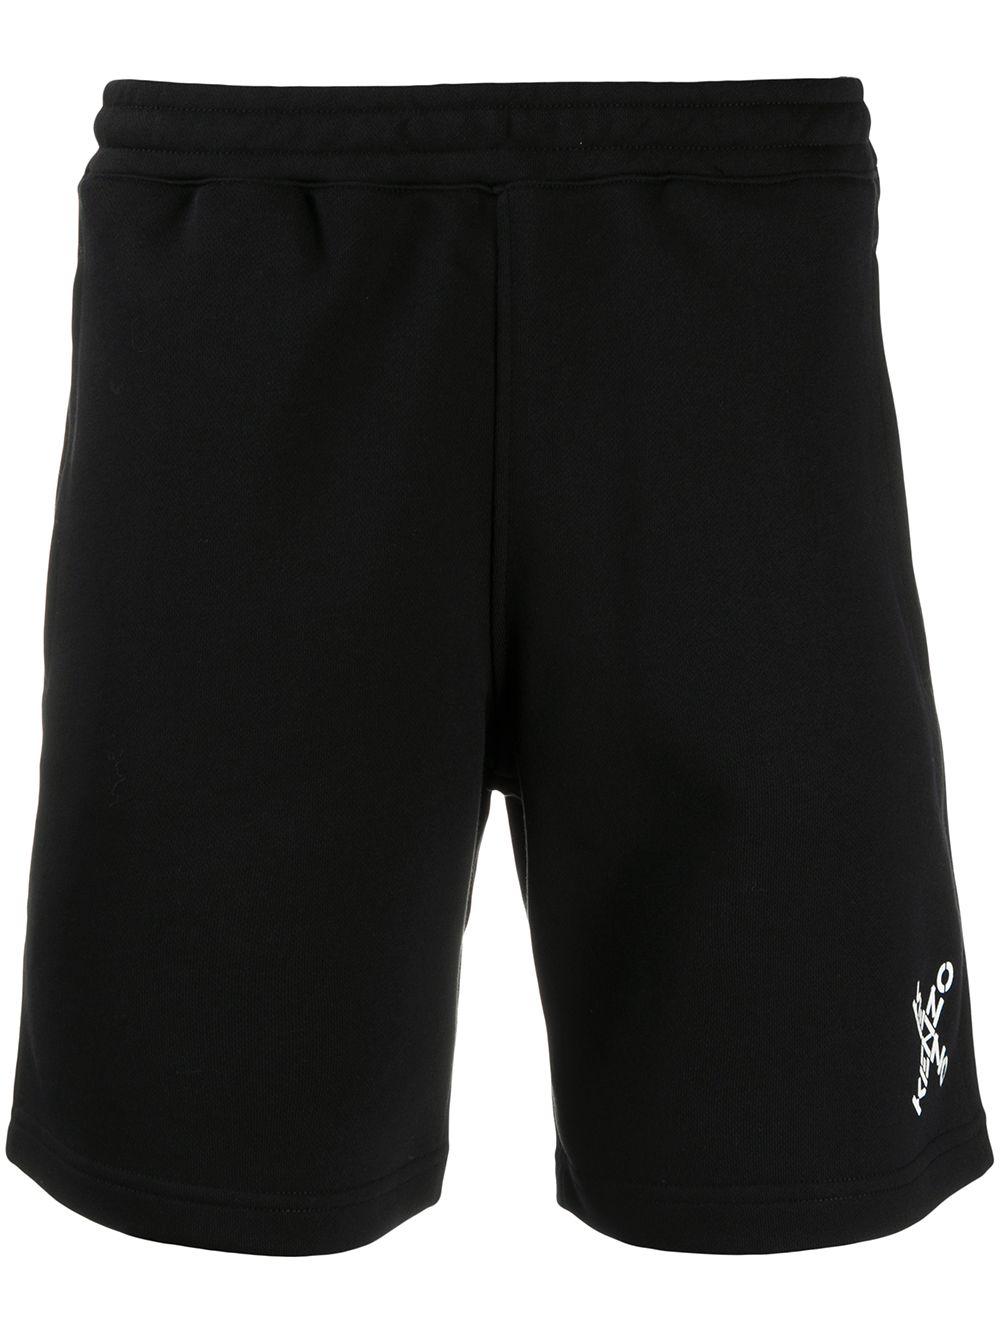 LOGO SHORTS KENZO | Shorts | FA65PA7204MS99